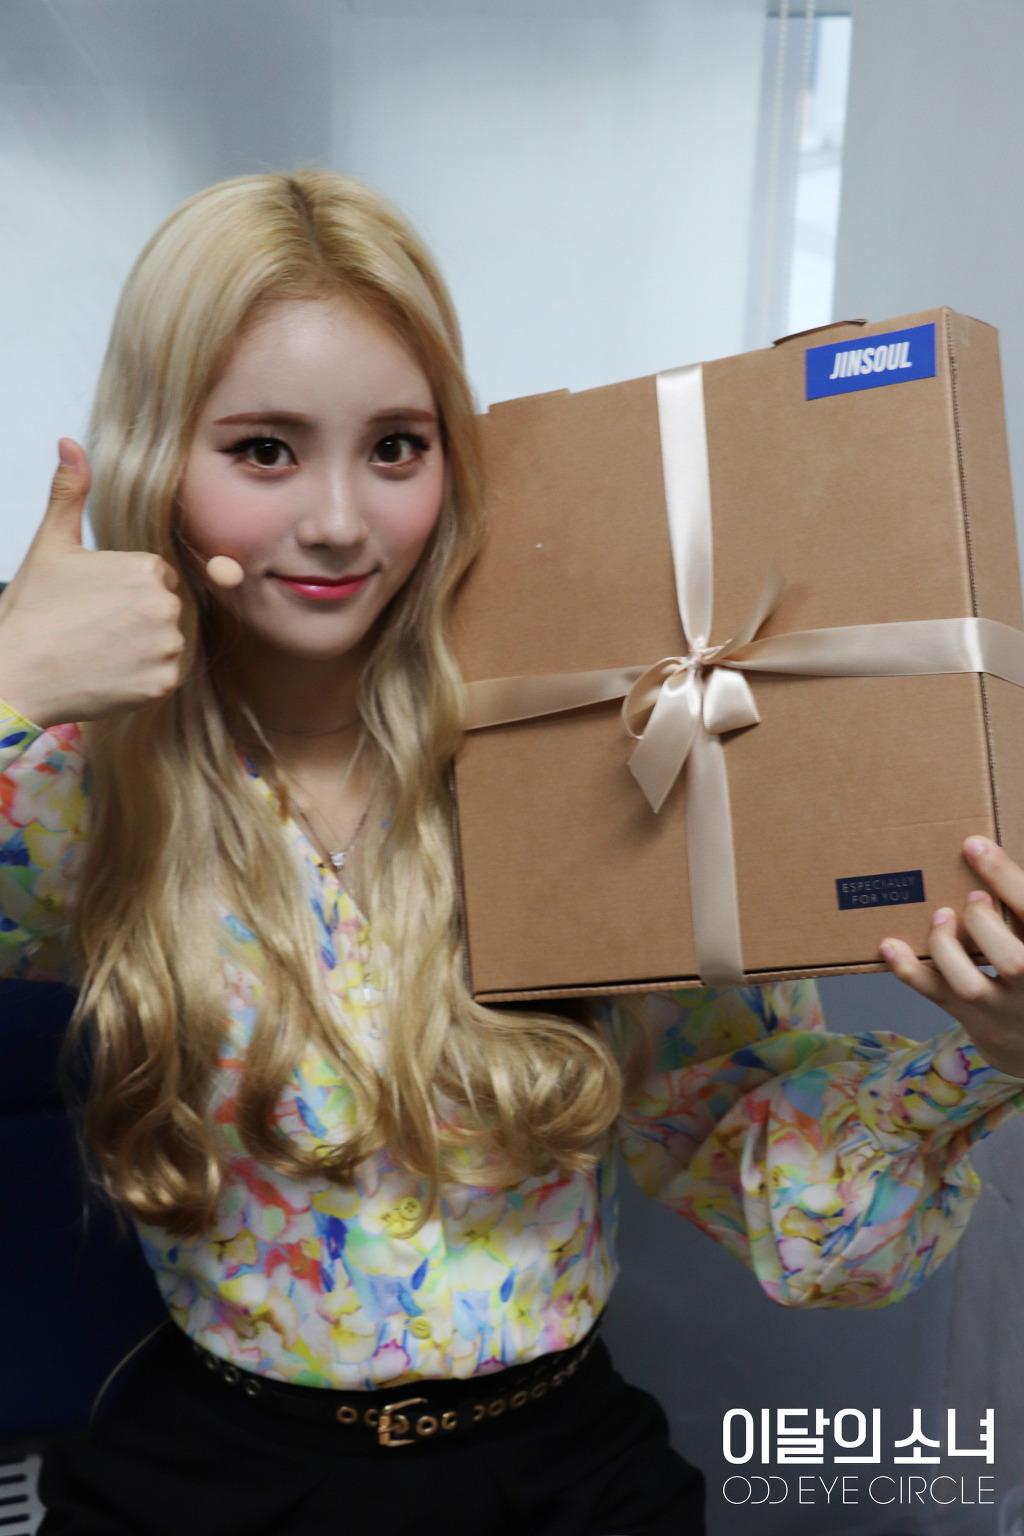 170924 SNS Inkigayo Diary JinSoul 1.jpg